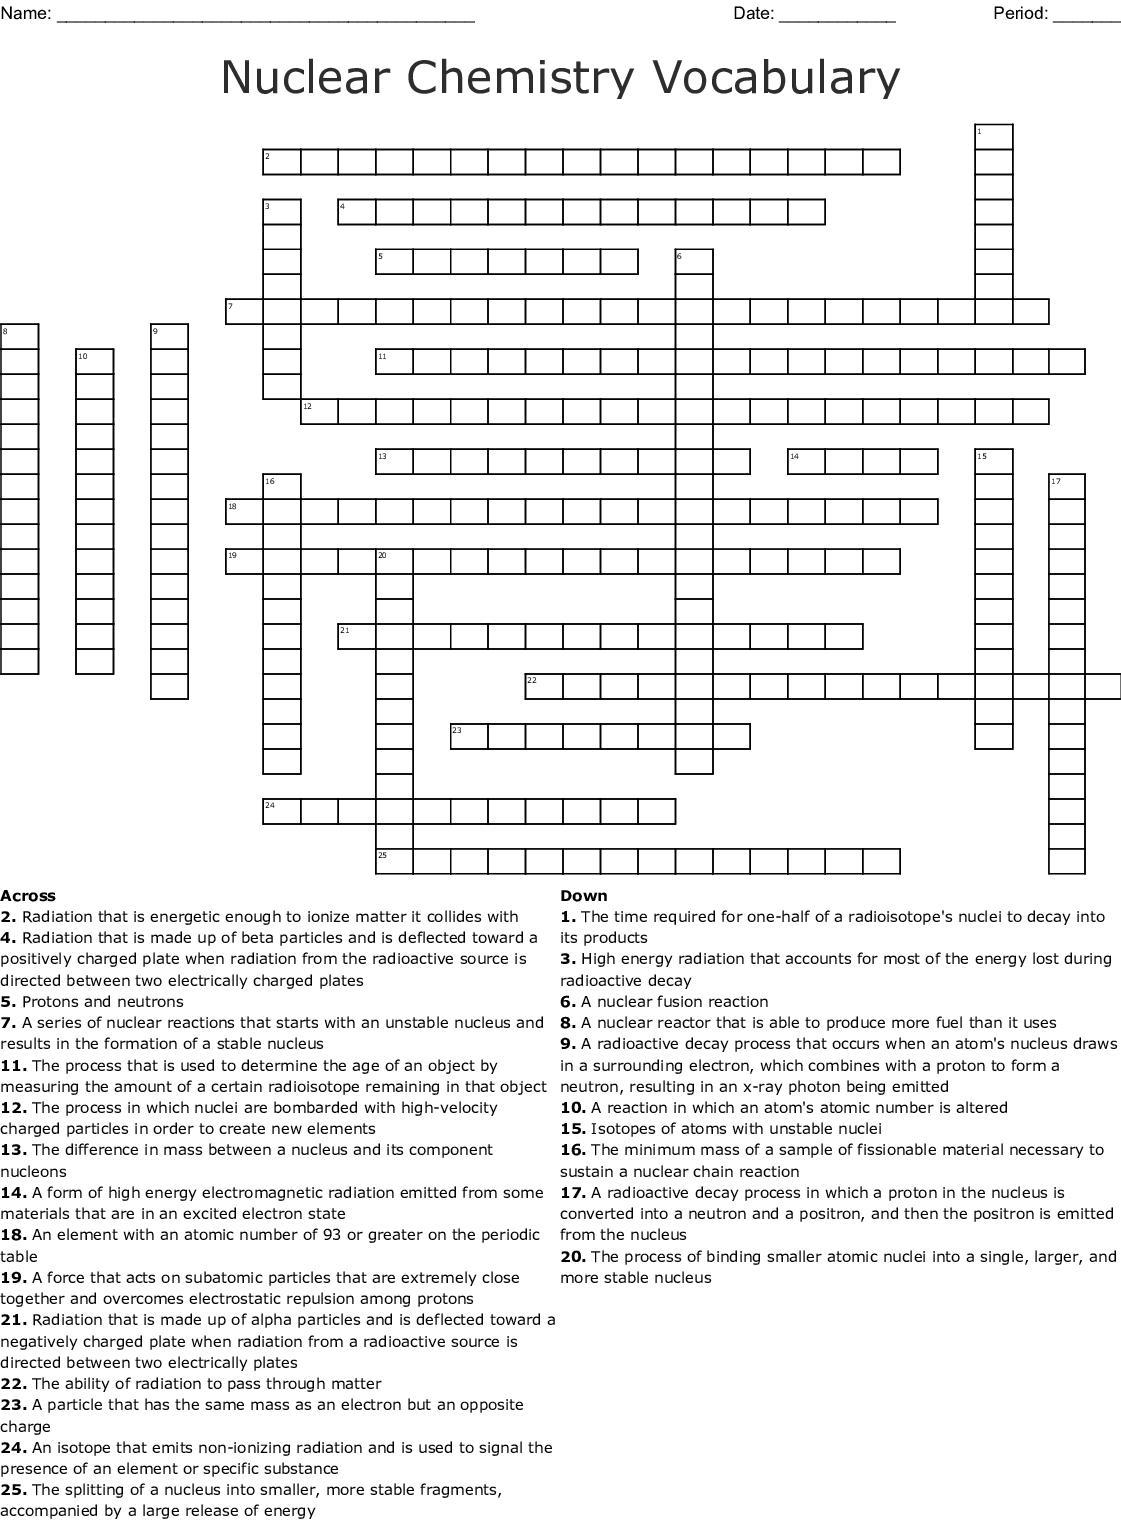 Radiation Safety Crossword